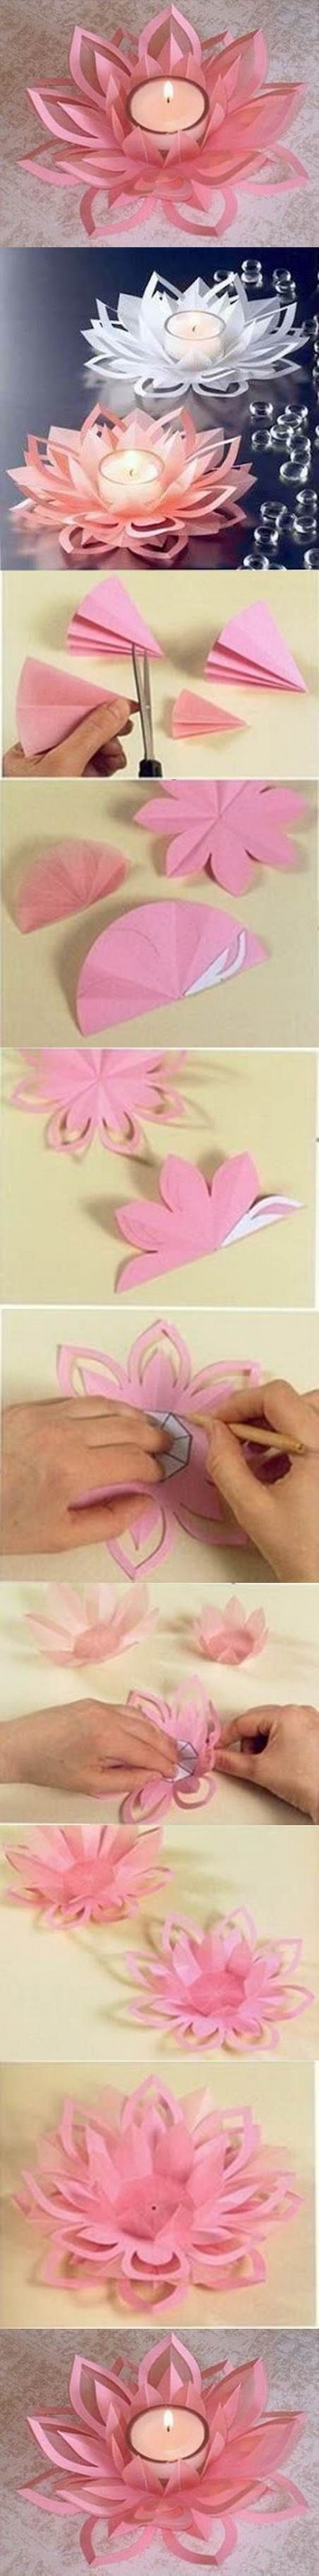 DIY Paper Lotus Candle Holders.